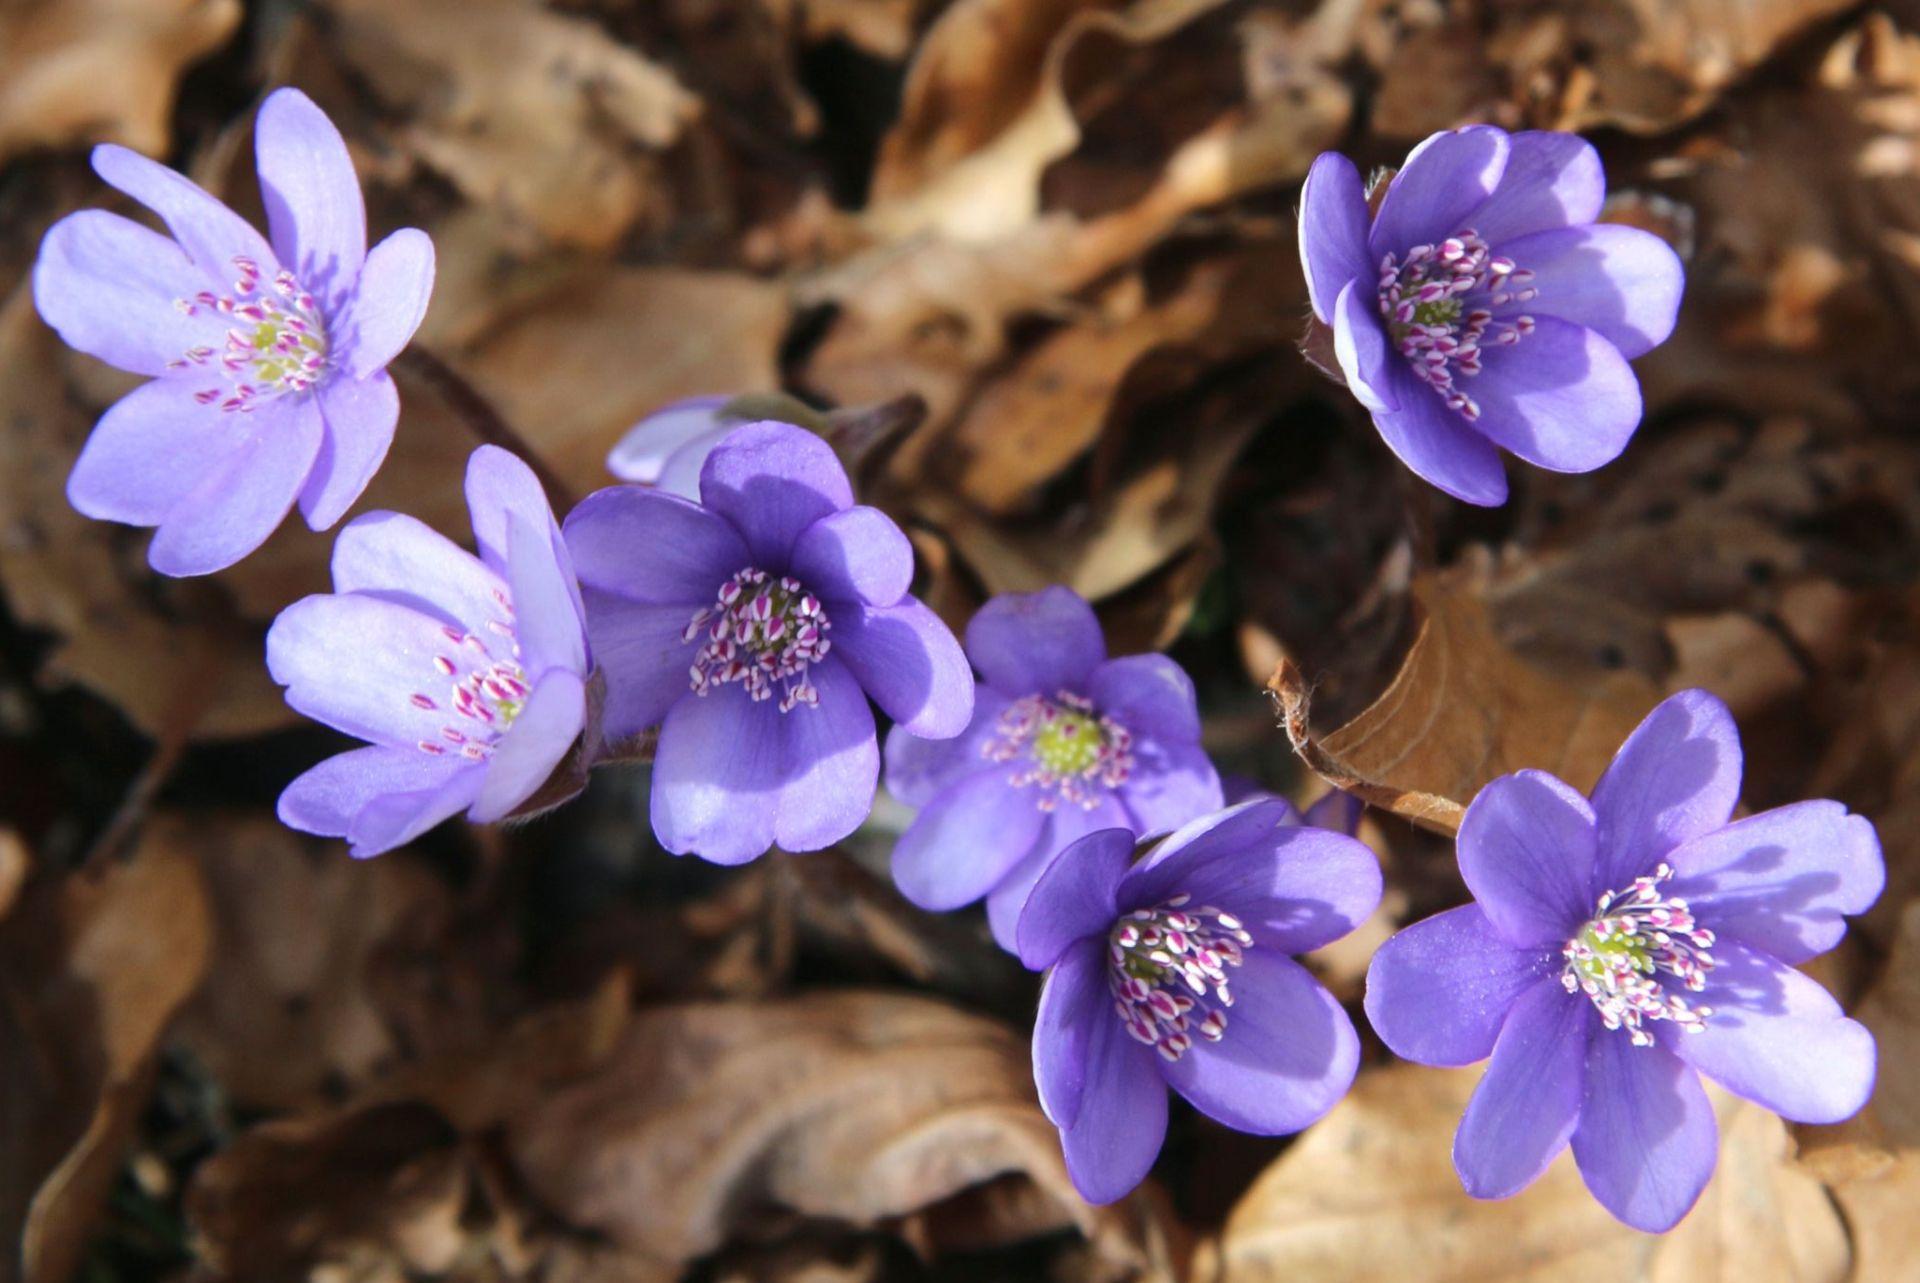 lilac wood anemone